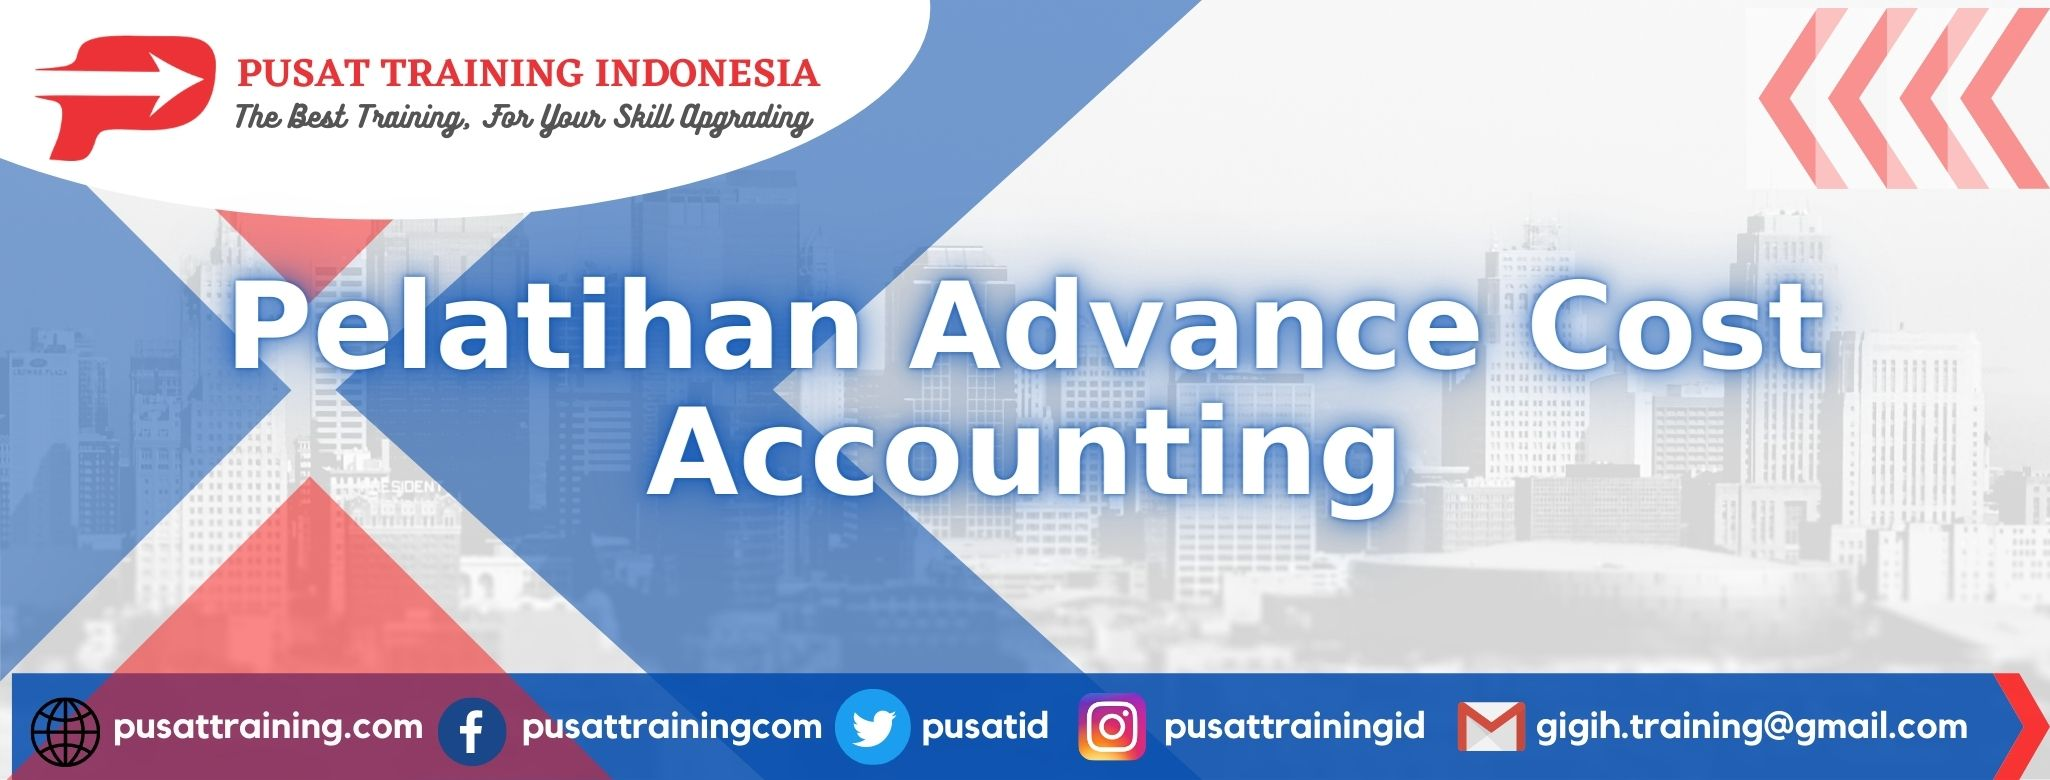 Pelatihan-Advance-Cost-Accounting